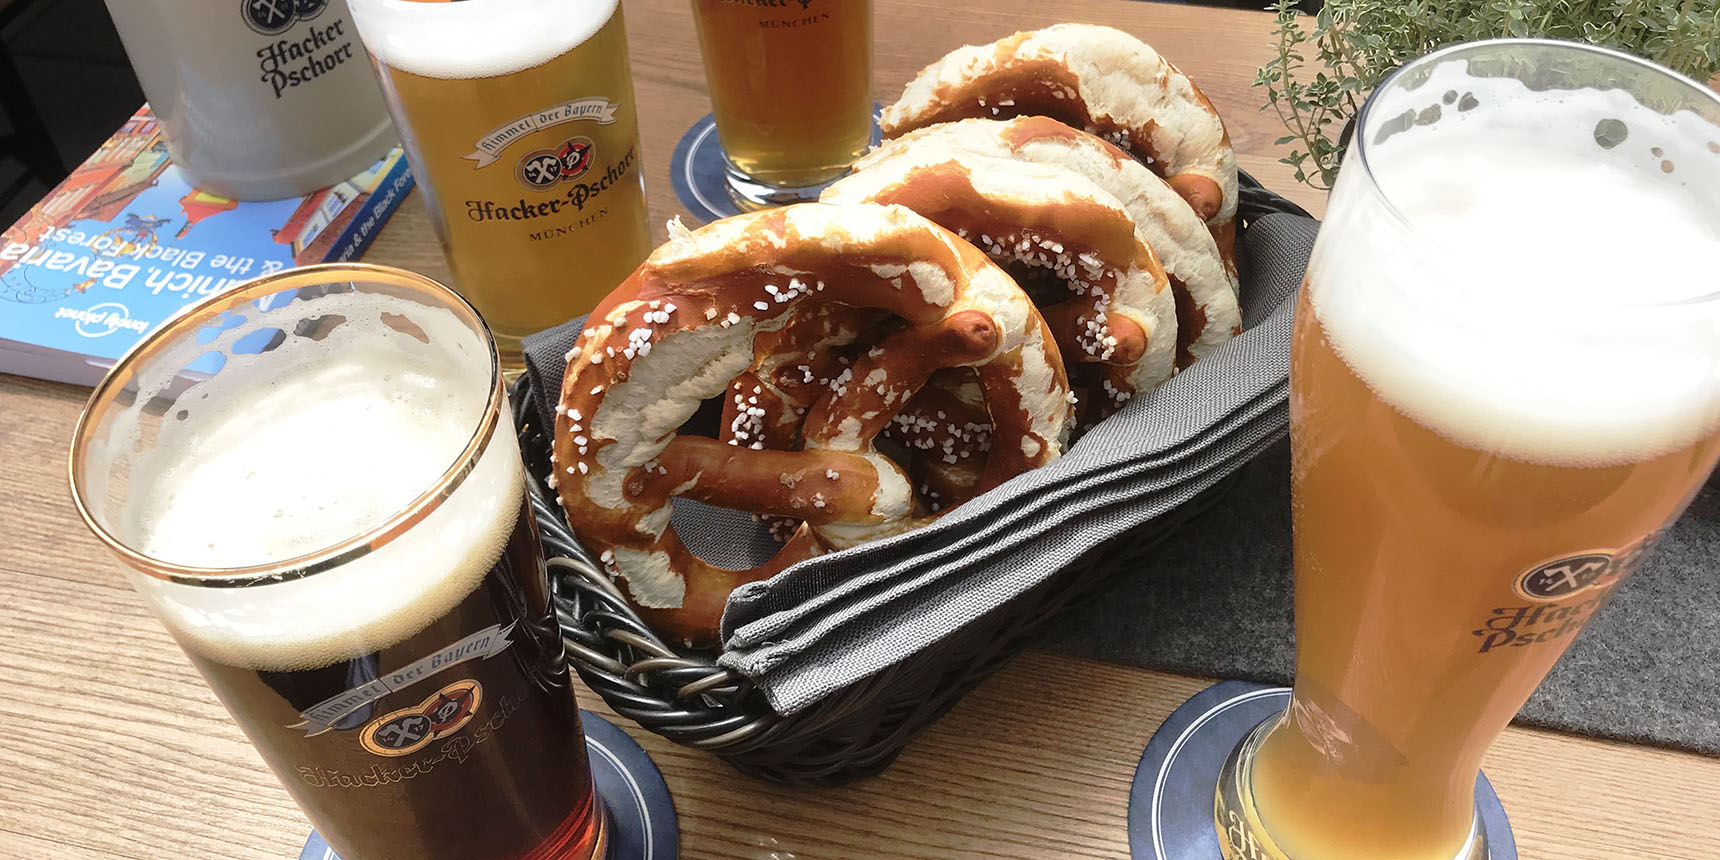 Beer and Pretzel - Oktoberfest